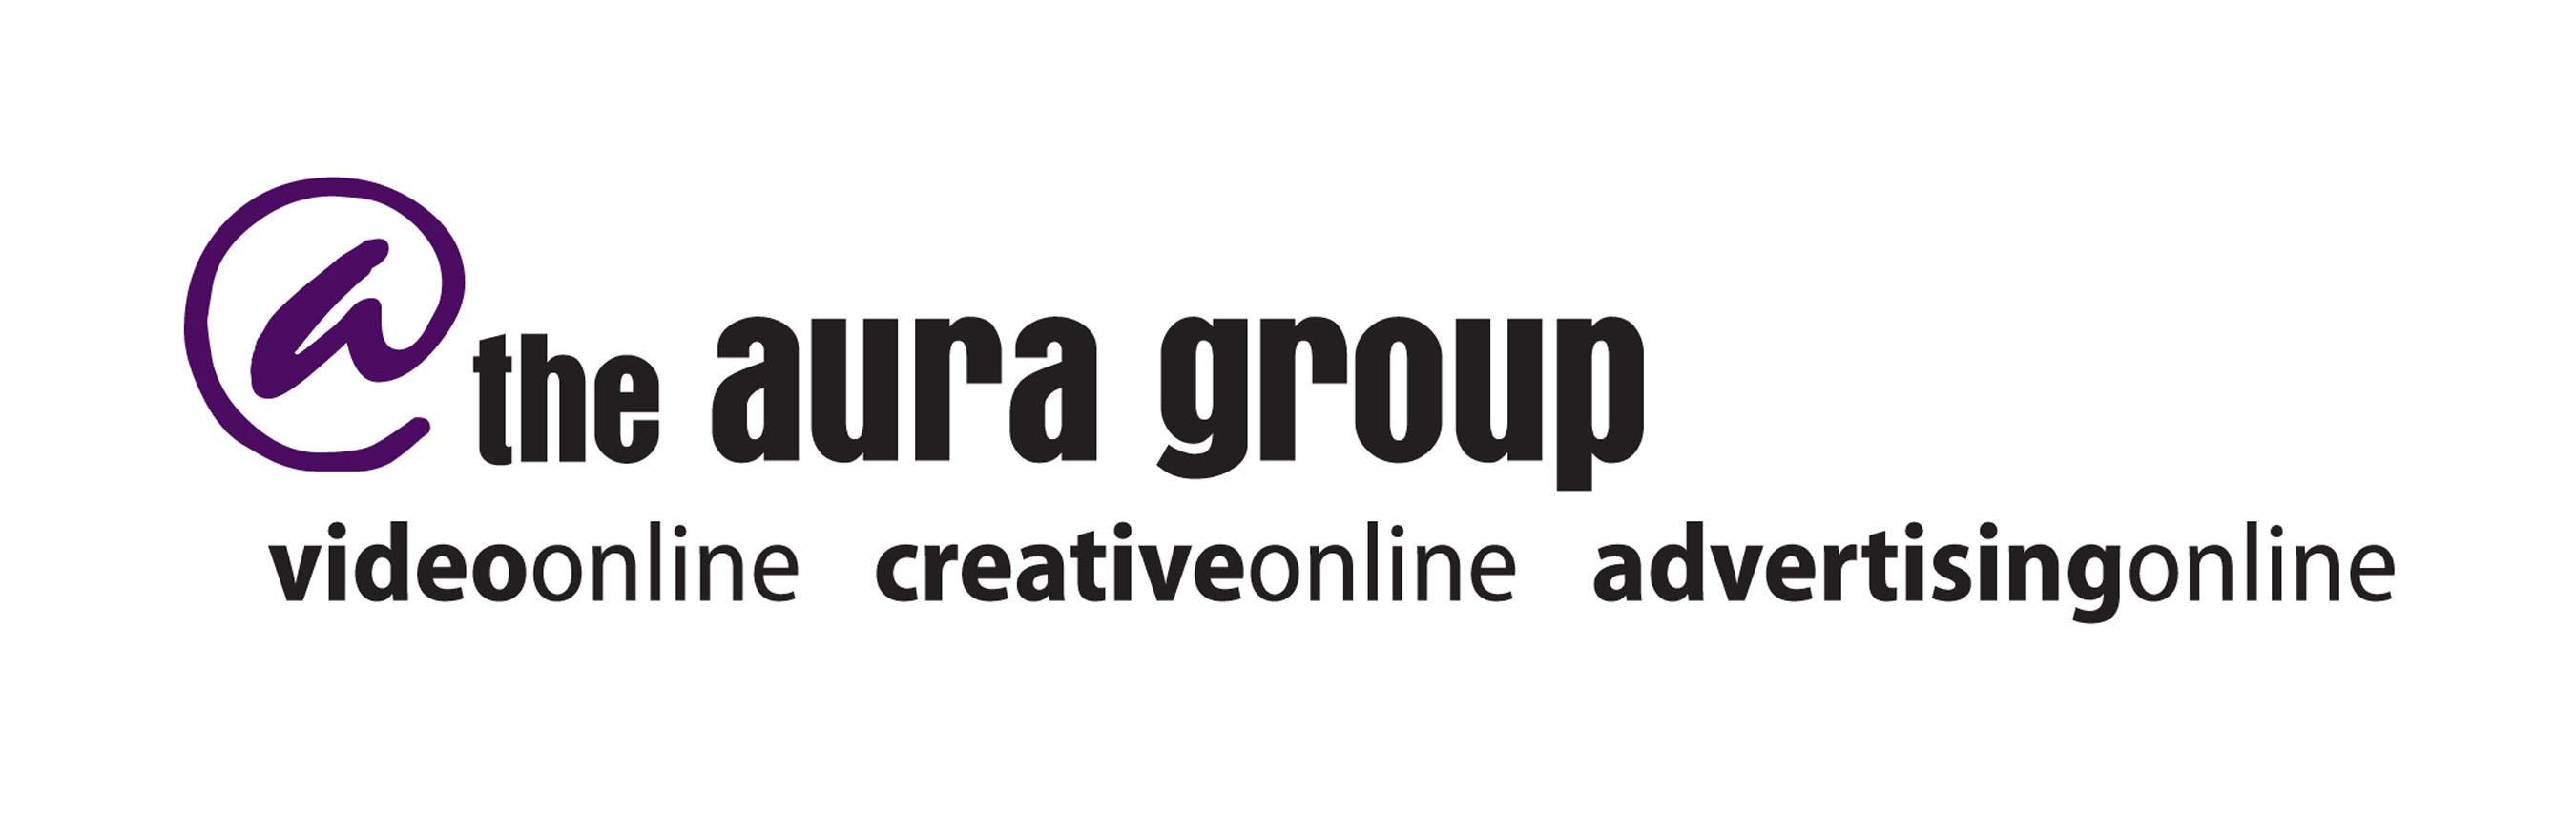 Offering creative online exposure through rich media technologies and applications. (PRNewsFoto/The Aura Group) (PRNewsFoto/)